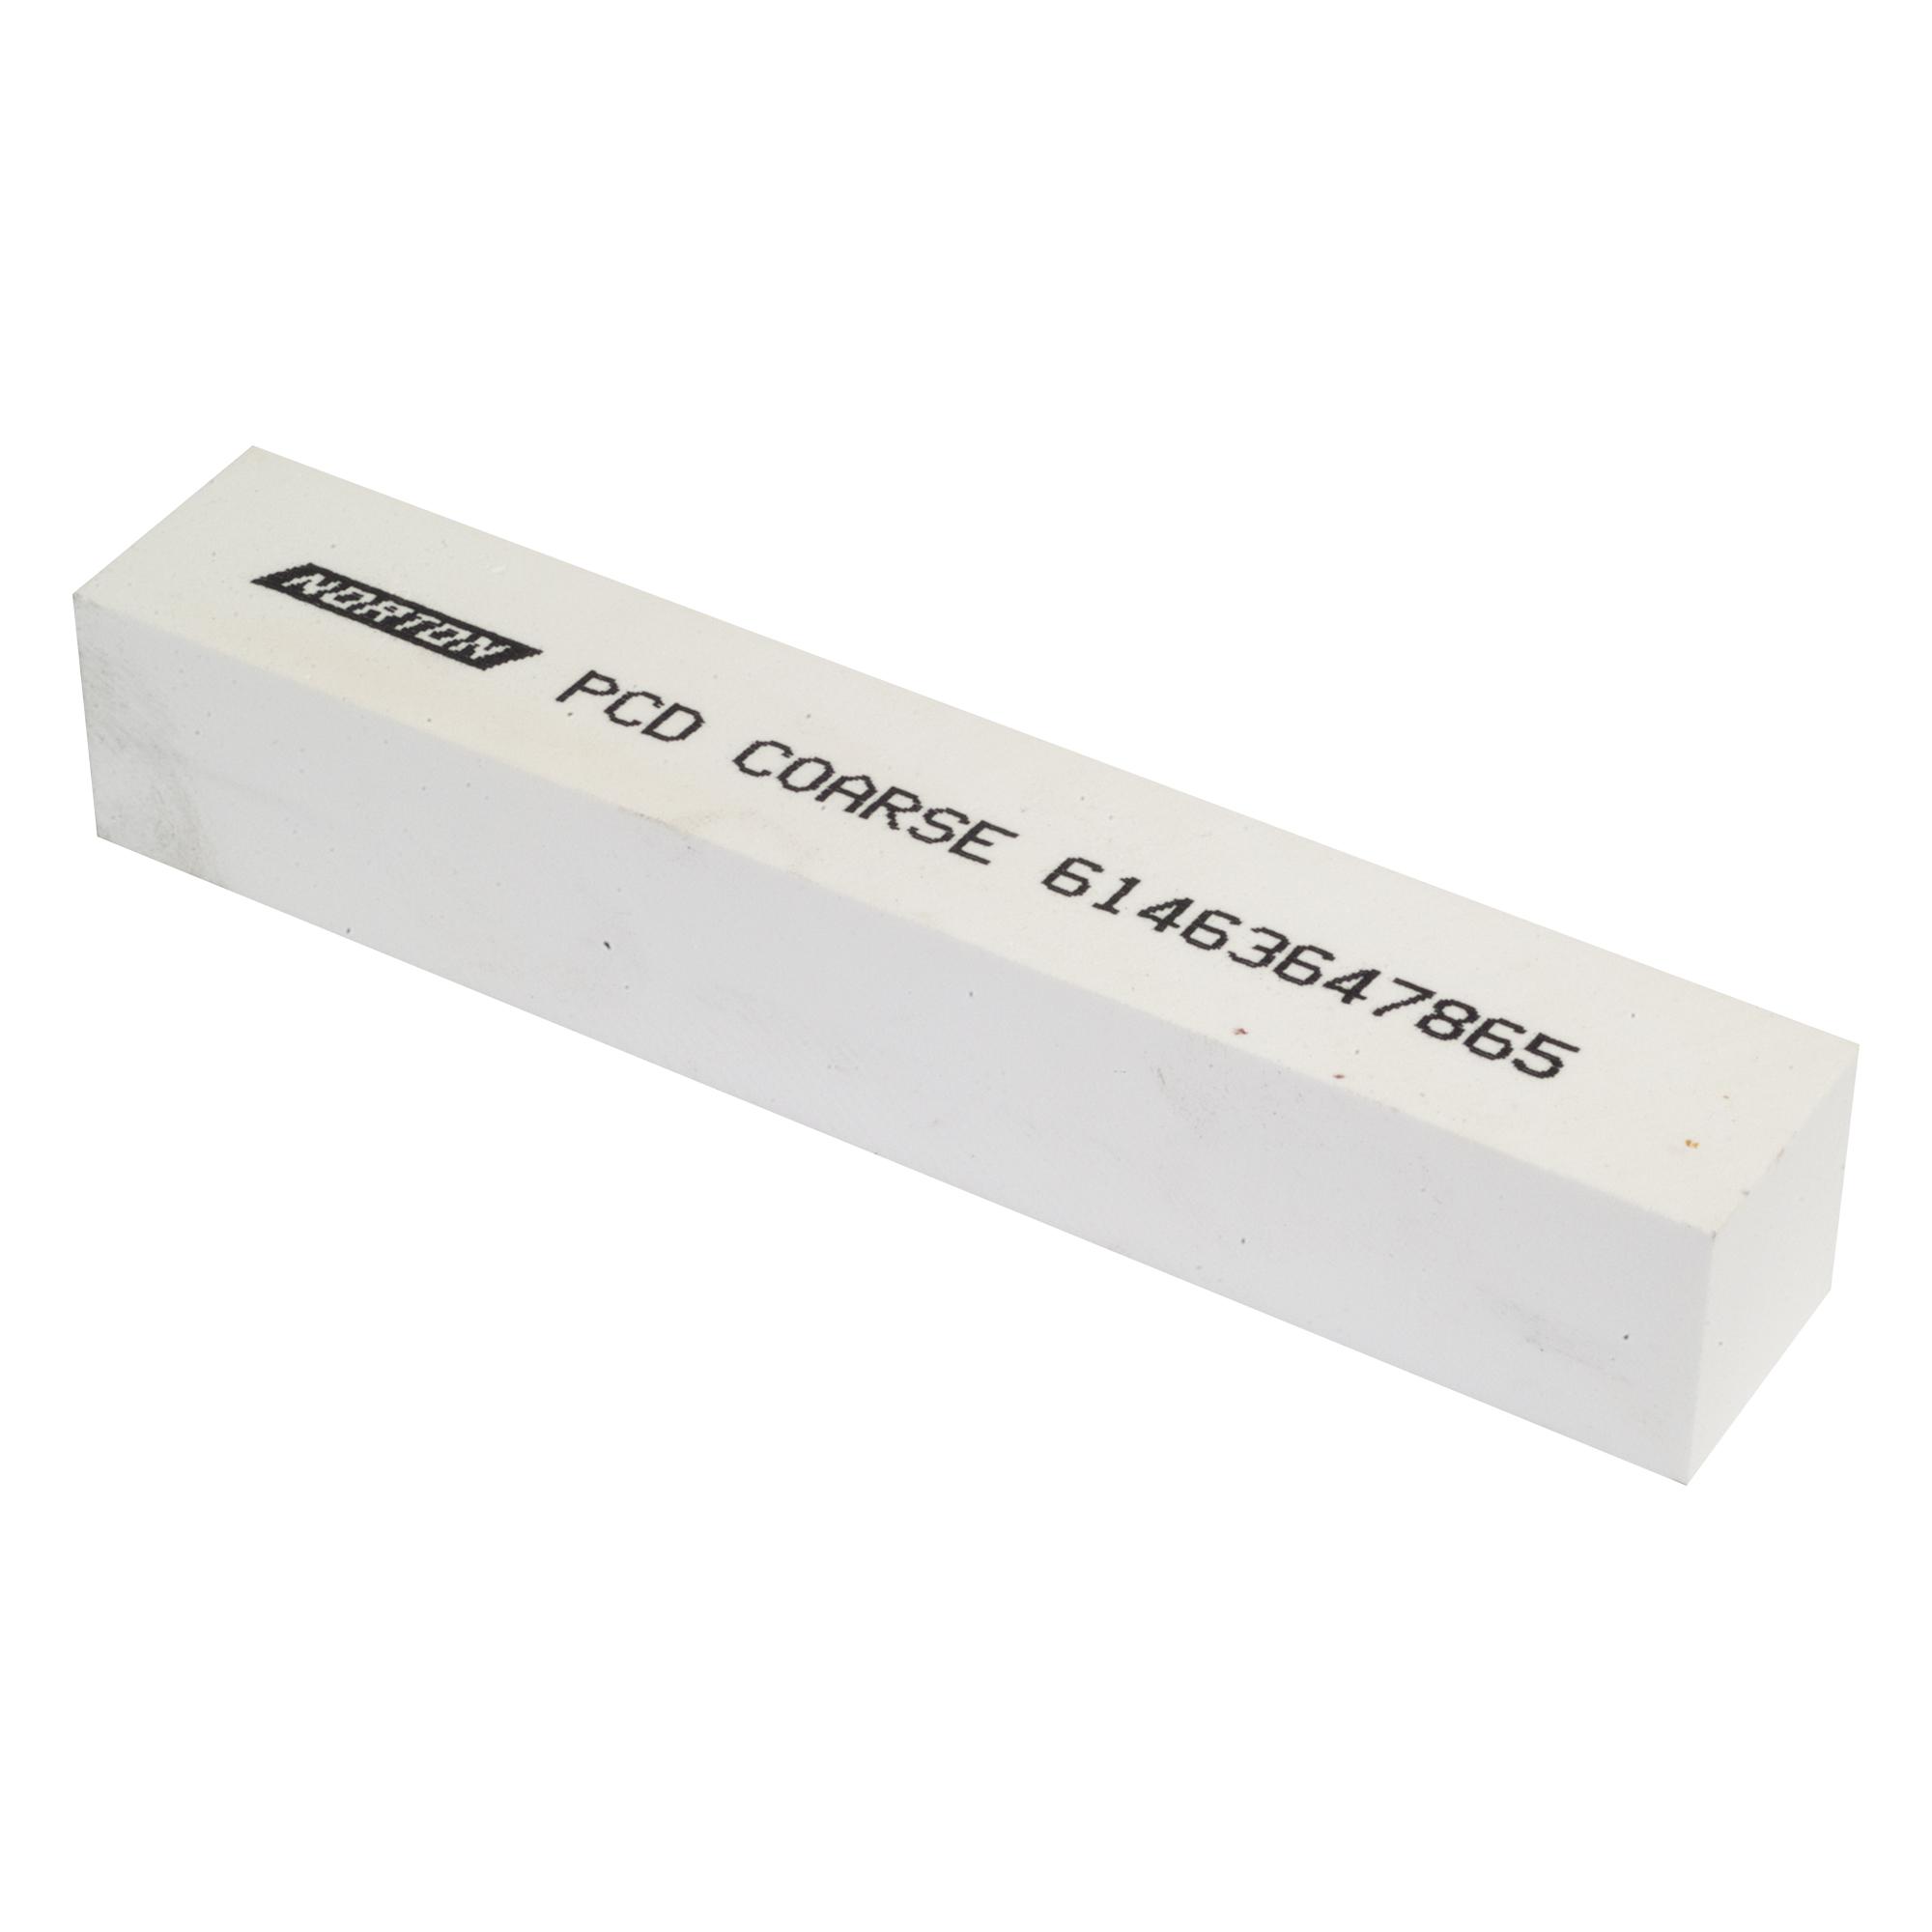 Norton Dressing Stick 61463610455